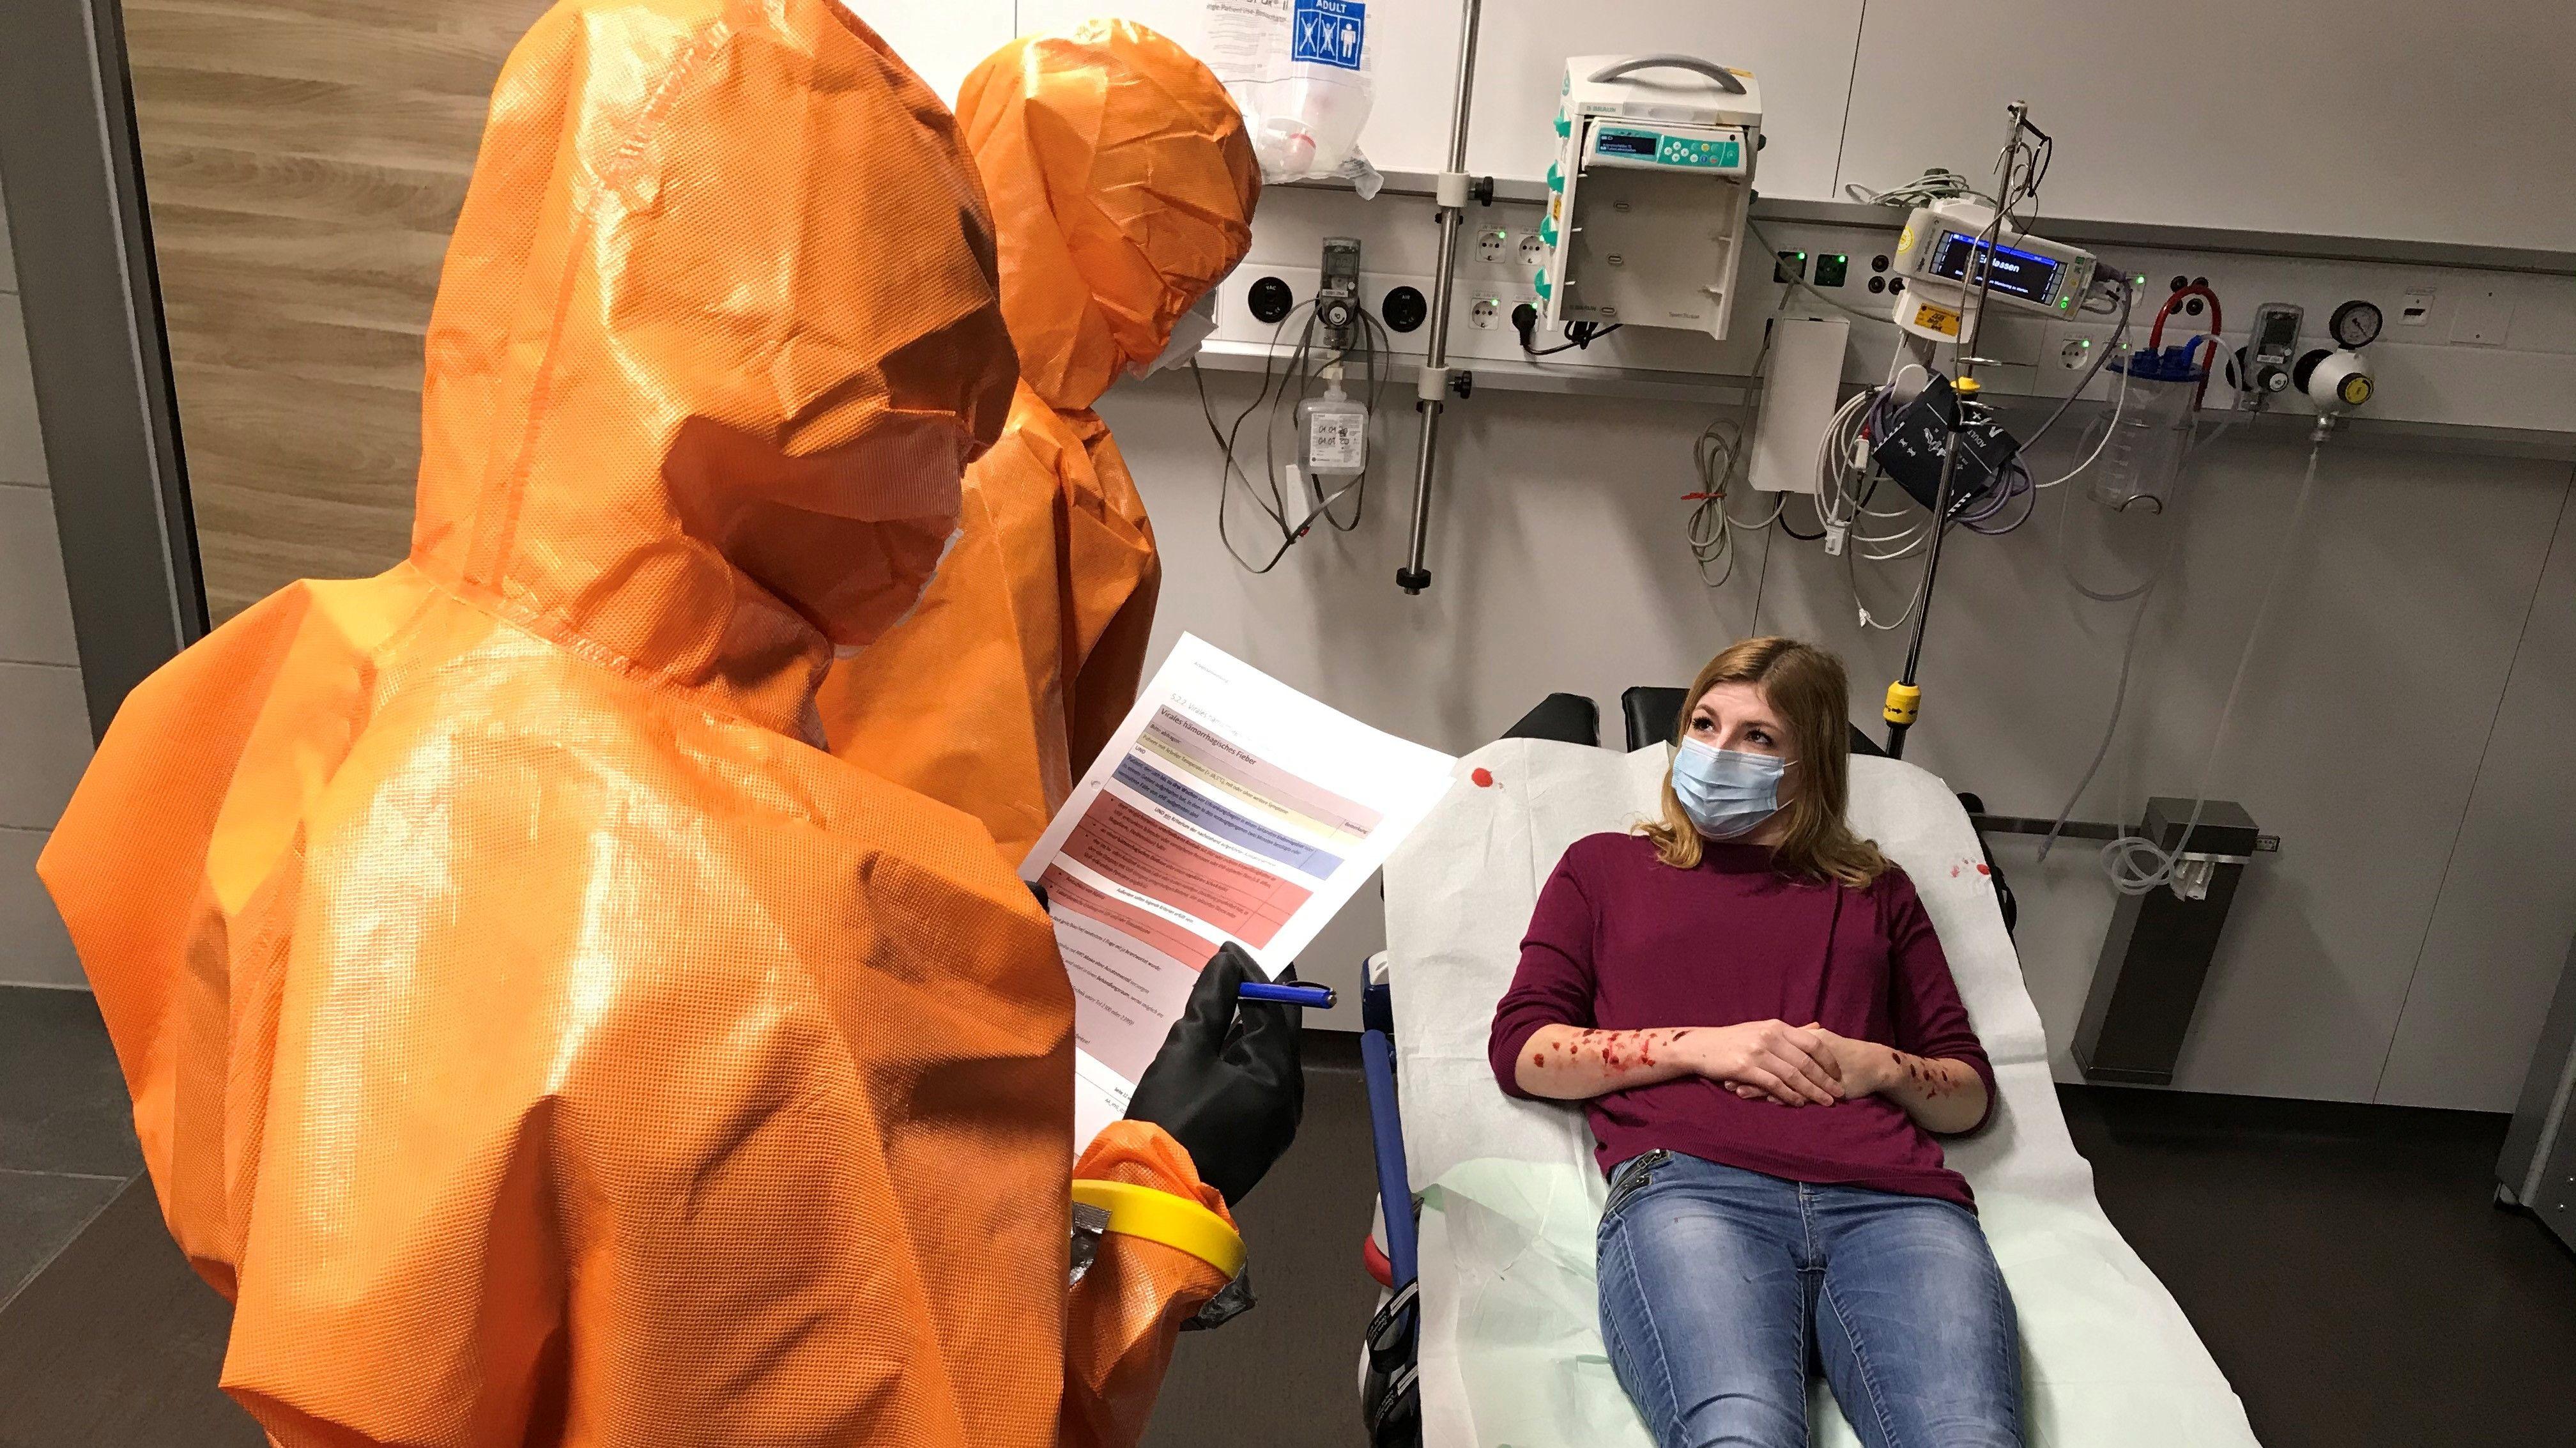 Pandemie-Übung am Josefskrankenhaus in Regensburg.